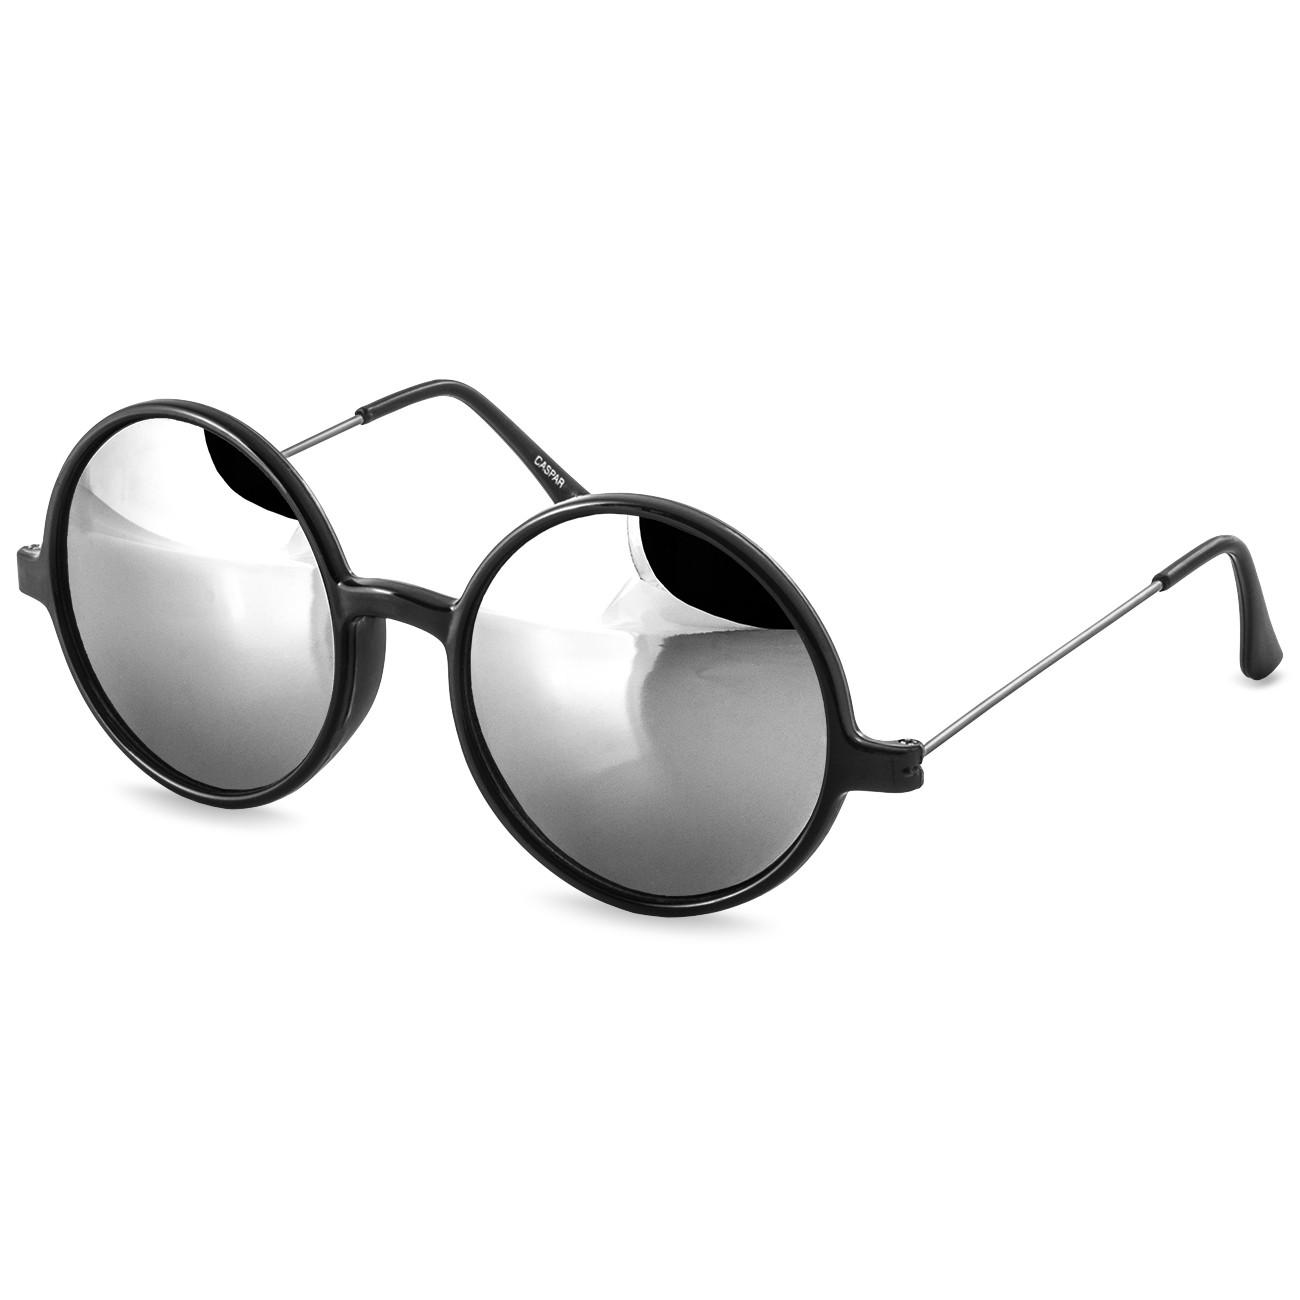 gro halbrahmen runde sonnenbrille fotos bilderrahmen ideen. Black Bedroom Furniture Sets. Home Design Ideas